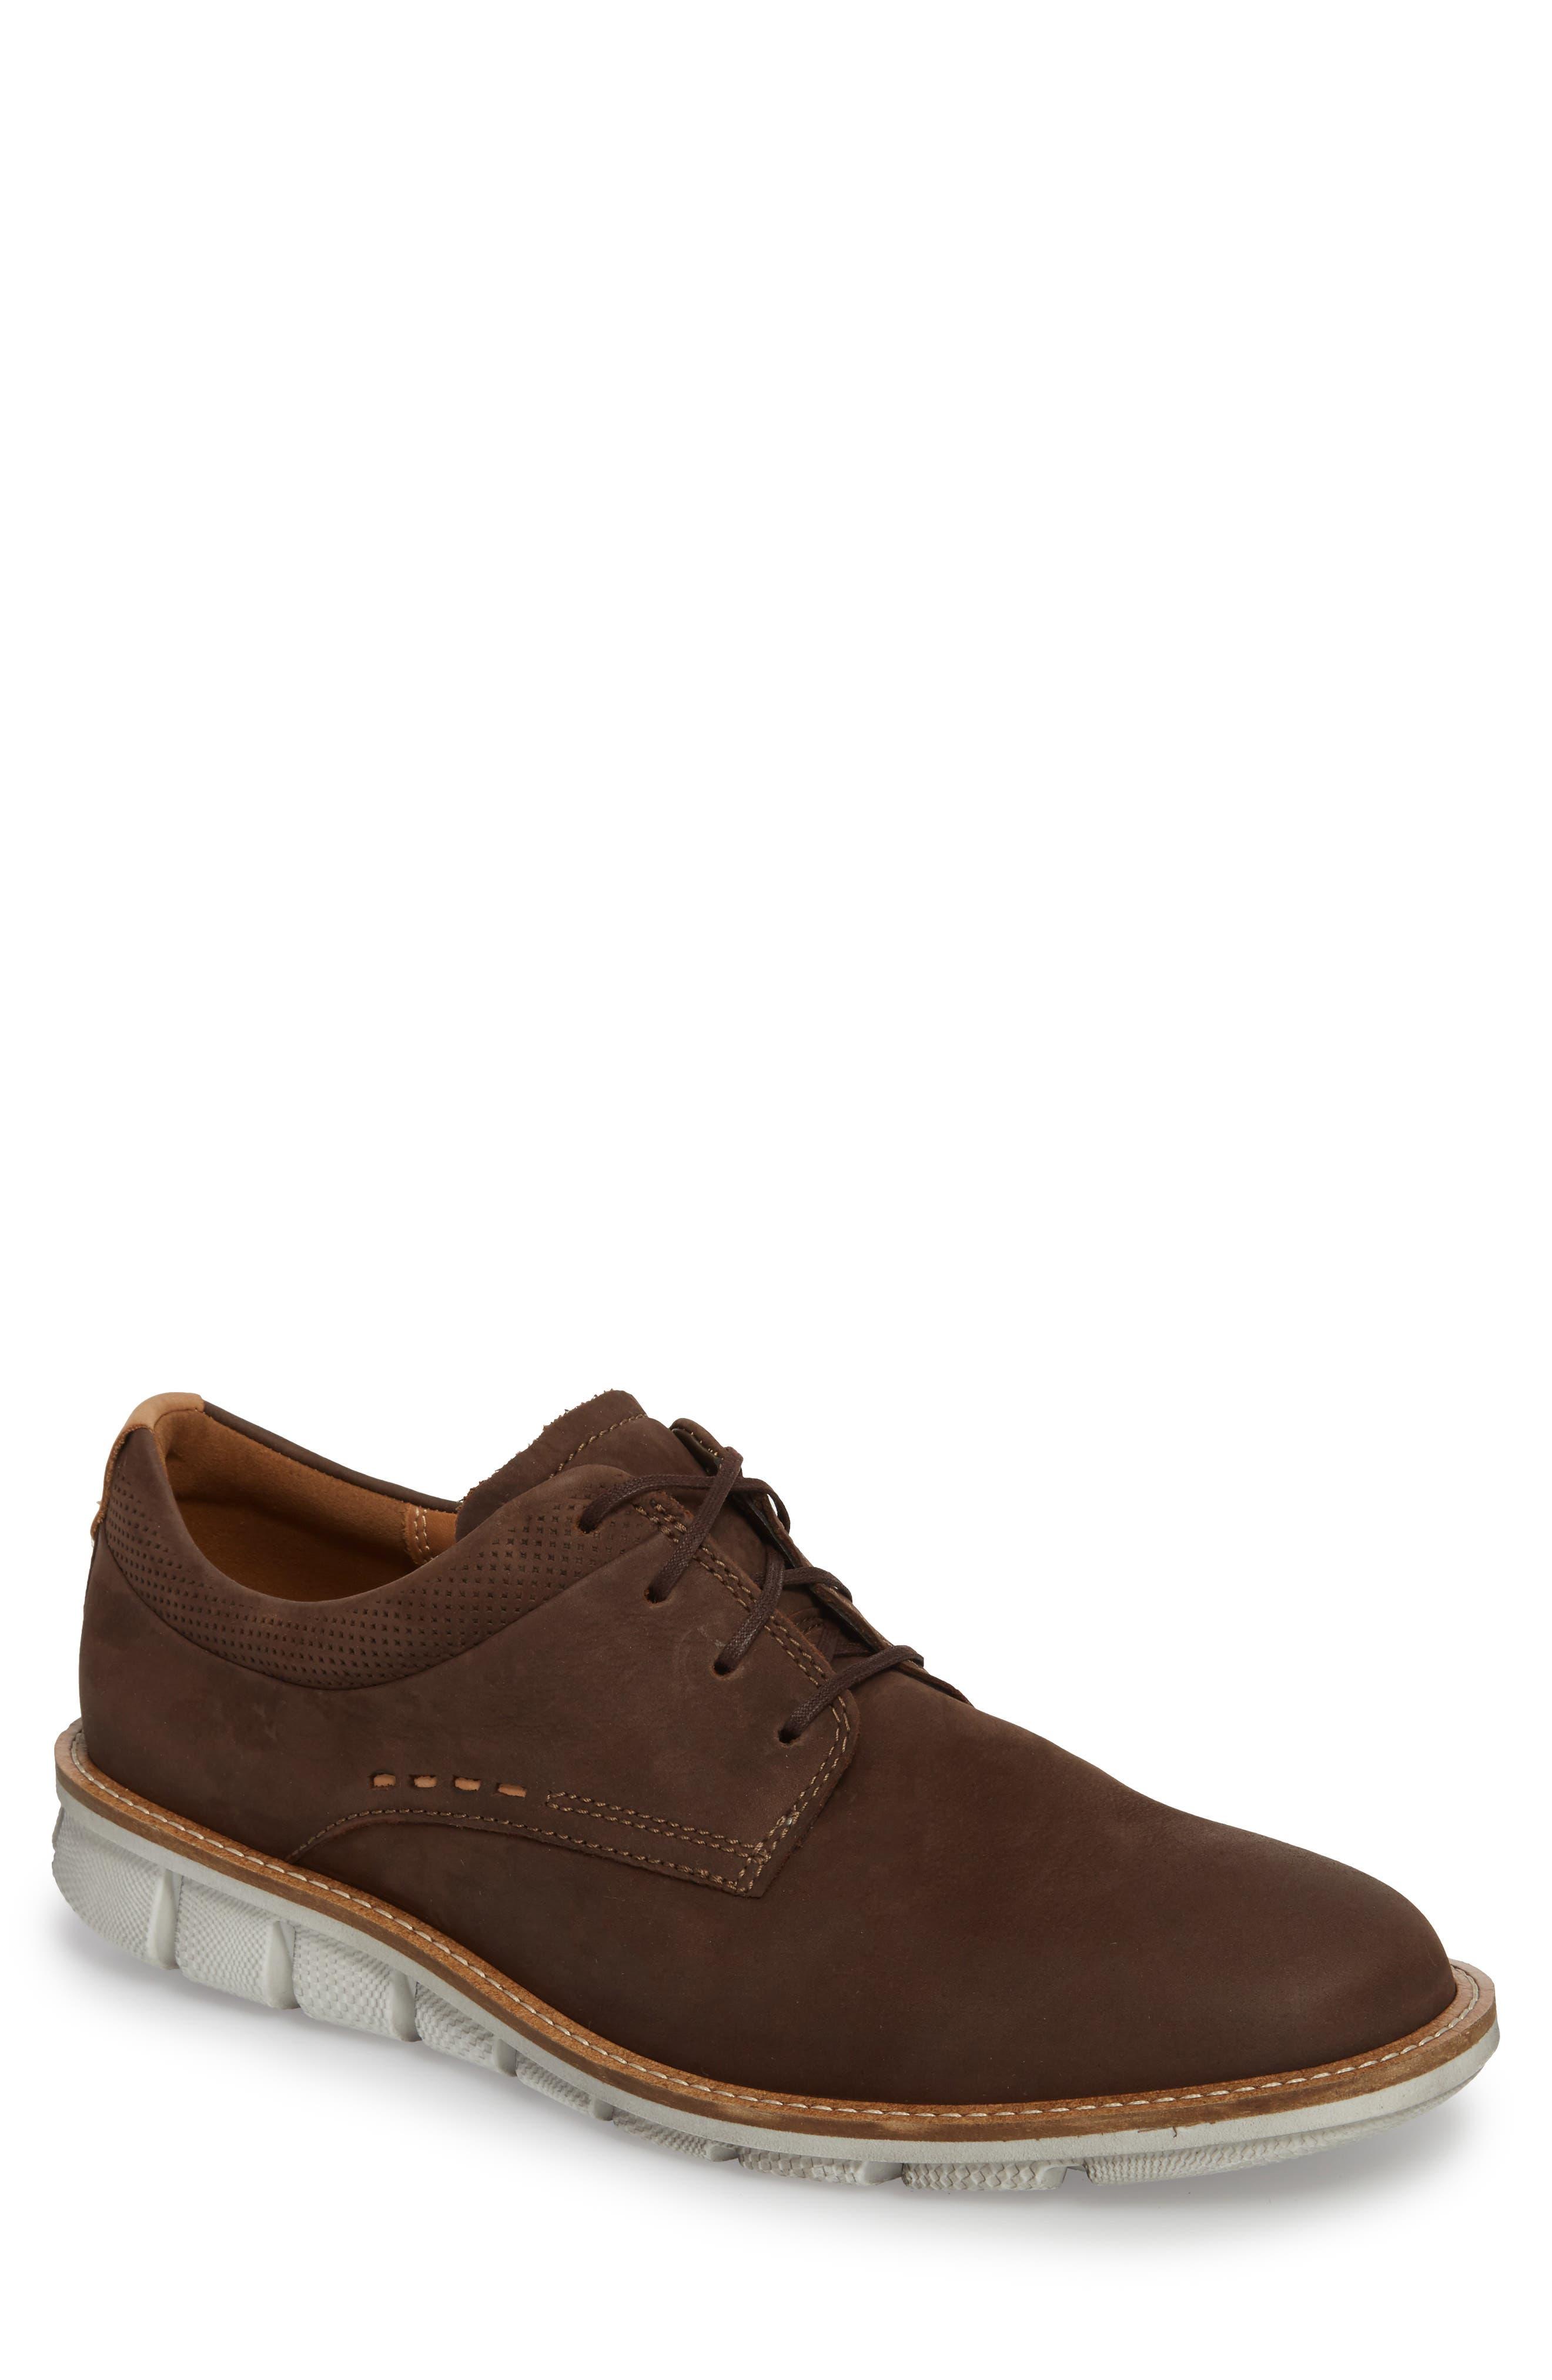 Jeremy Hybrid Plain Toe Derby,                             Main thumbnail 1, color,                             Coffee Leather